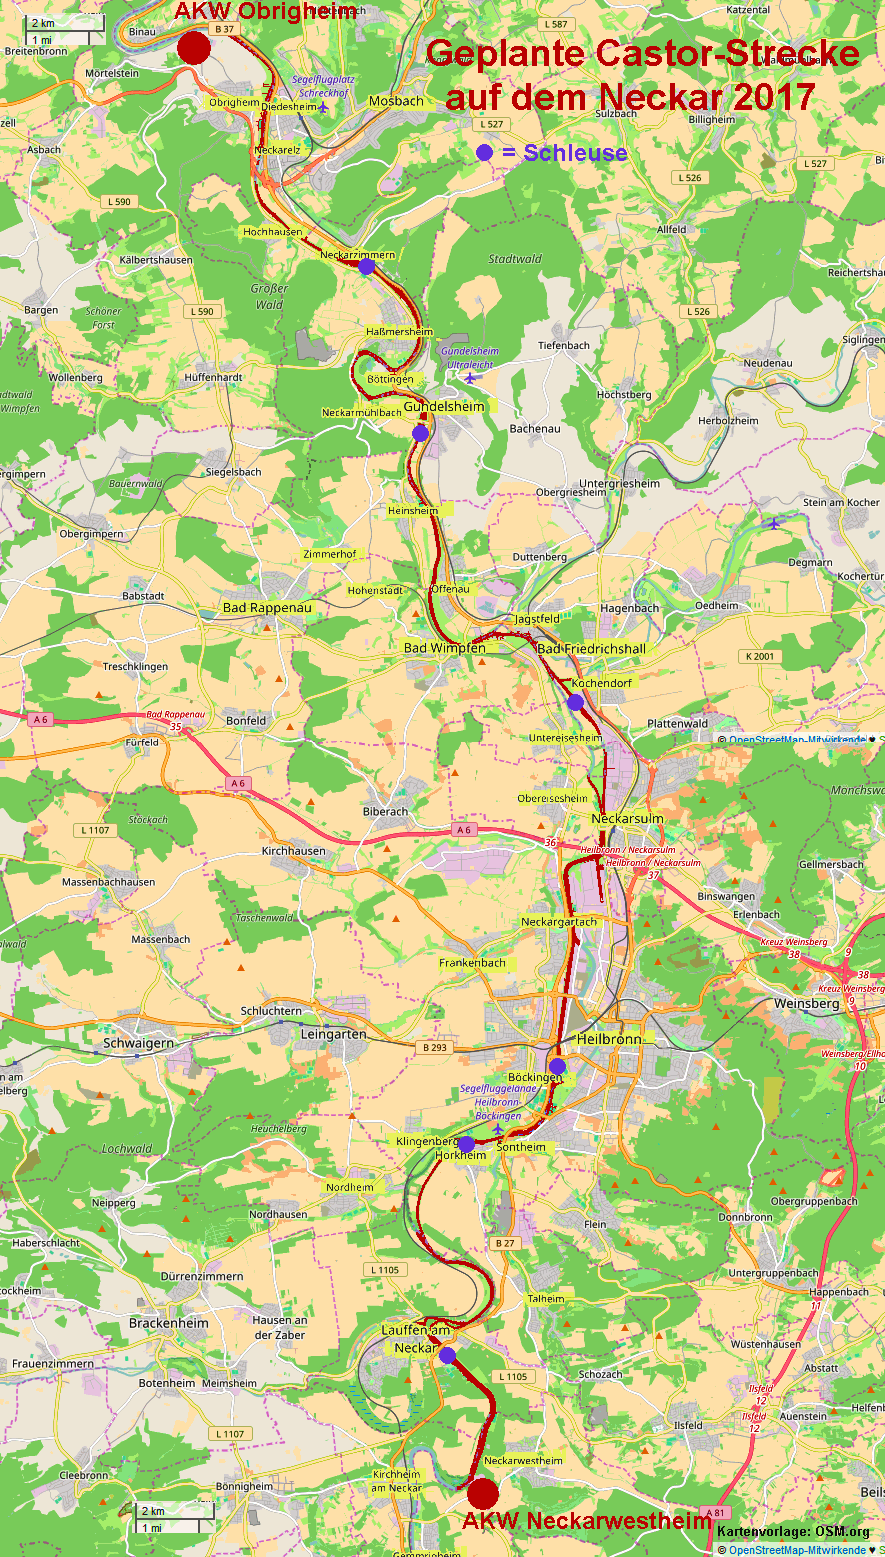 Neckarradweg Karte.Bündnis Neckar Castorfrei Karte Der Transportstrecke Auf Dem Neckar